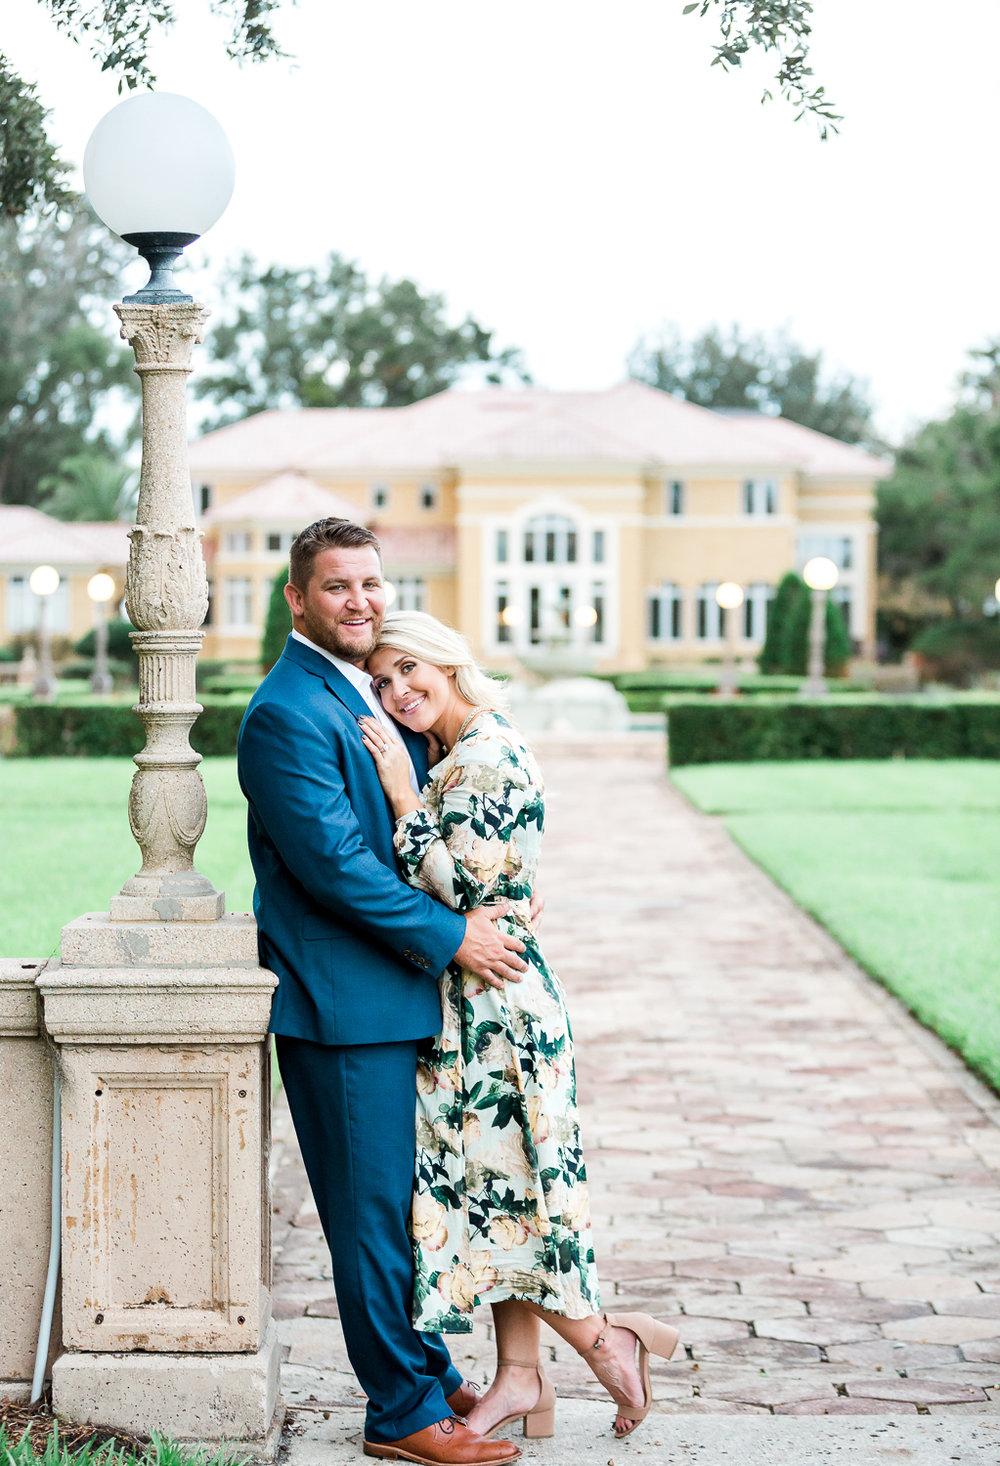 jacksonville engagement and wedding photographer